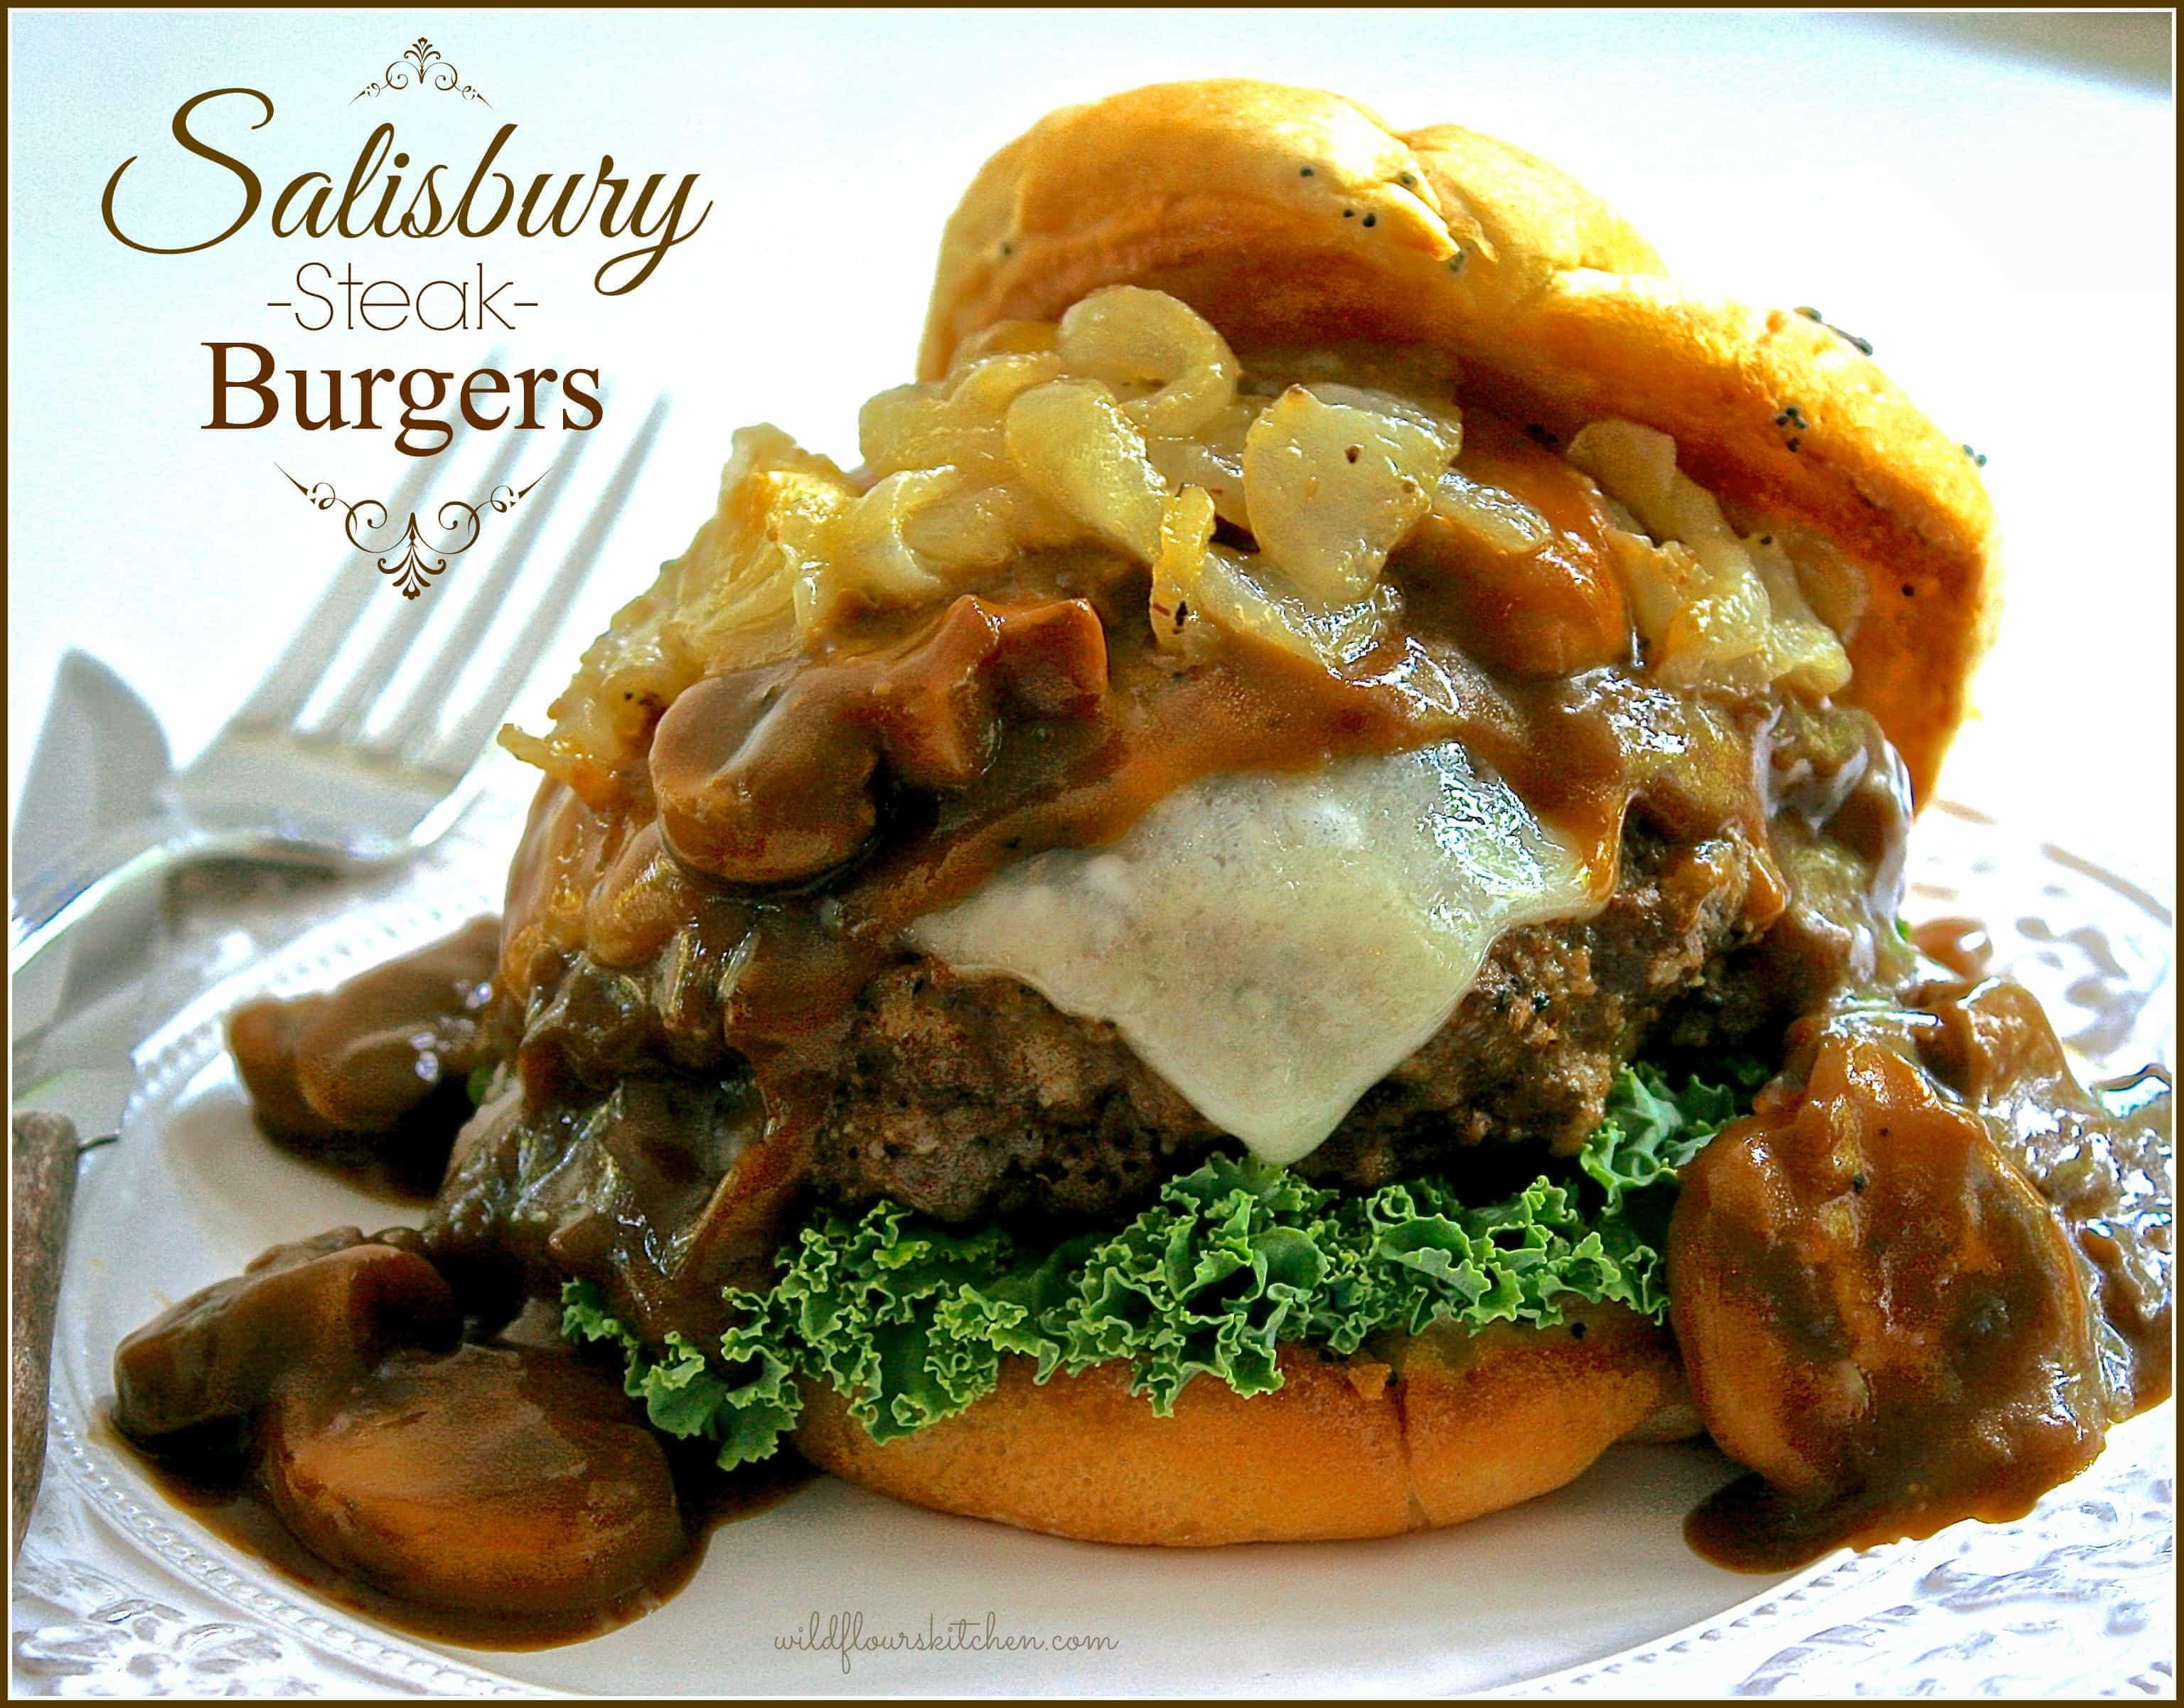 Restaurant Style Salisbury Steak Burgers With Swiss Cheese